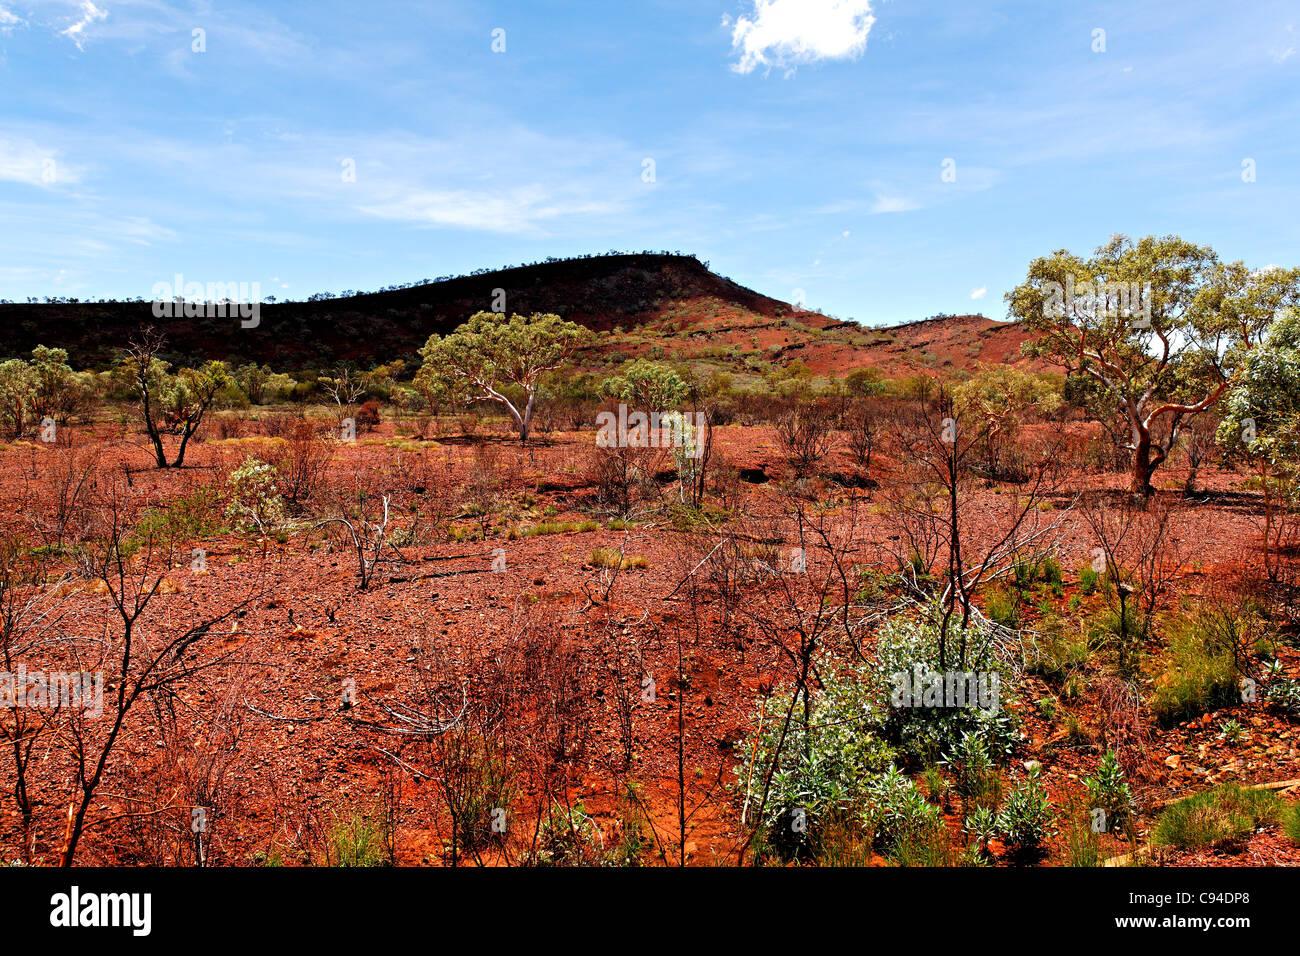 Australian outback landscape, Pilbara Western Australia - Stock Image